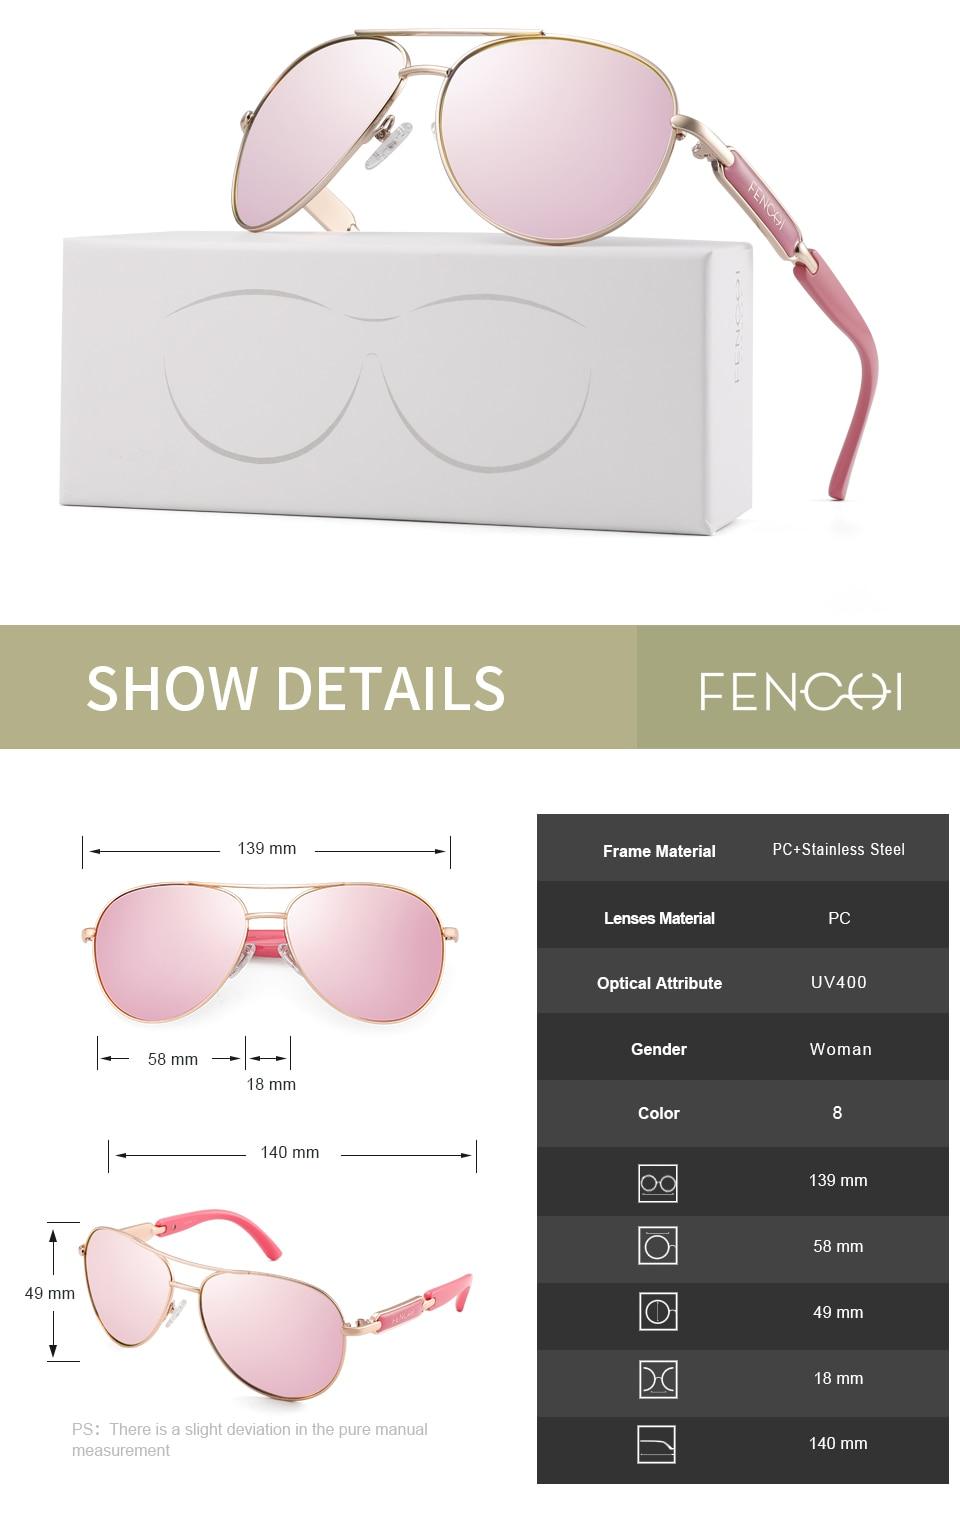 H09a026808d5c4b64ab8e2093ffdae91dP FENCHI Polarized Sunglasses Women Vintage Brand Glasses Driving Pilot Pink Mirror sunglasses Men ladies oculos de sol feminino